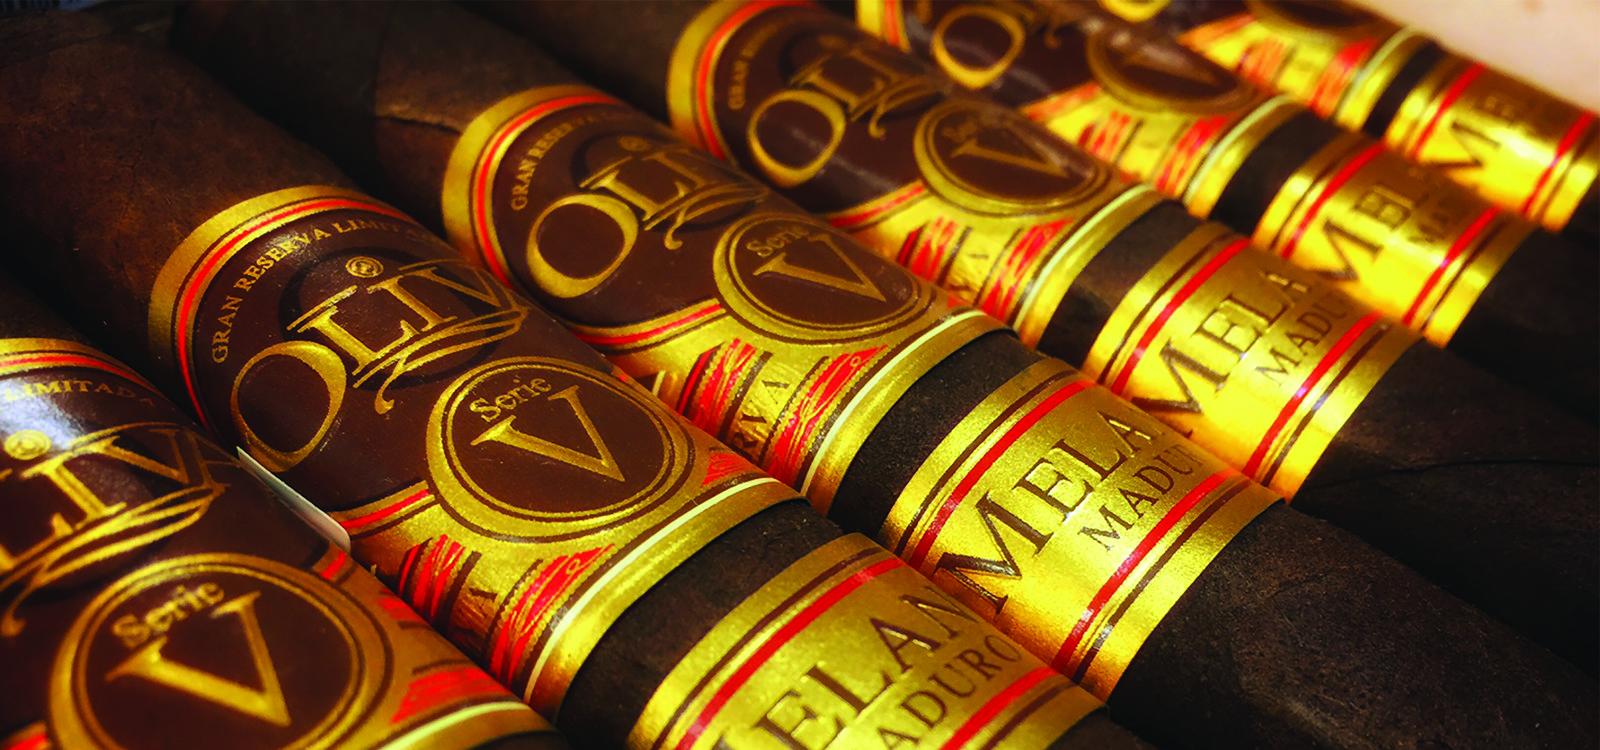 Cigar and Tabac ltd